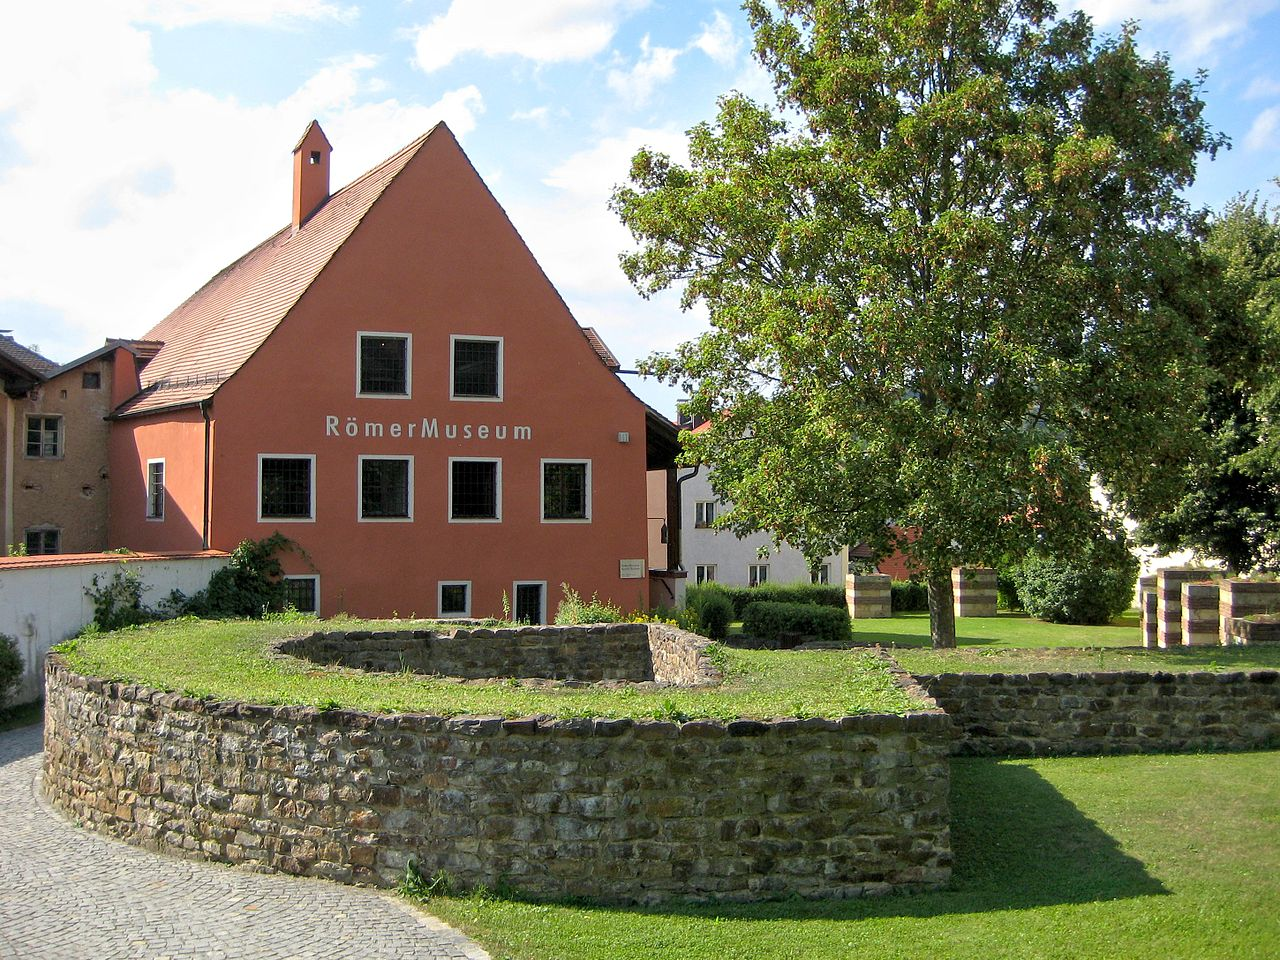 Bild RömerMuseum Kastell Boiotro Passau